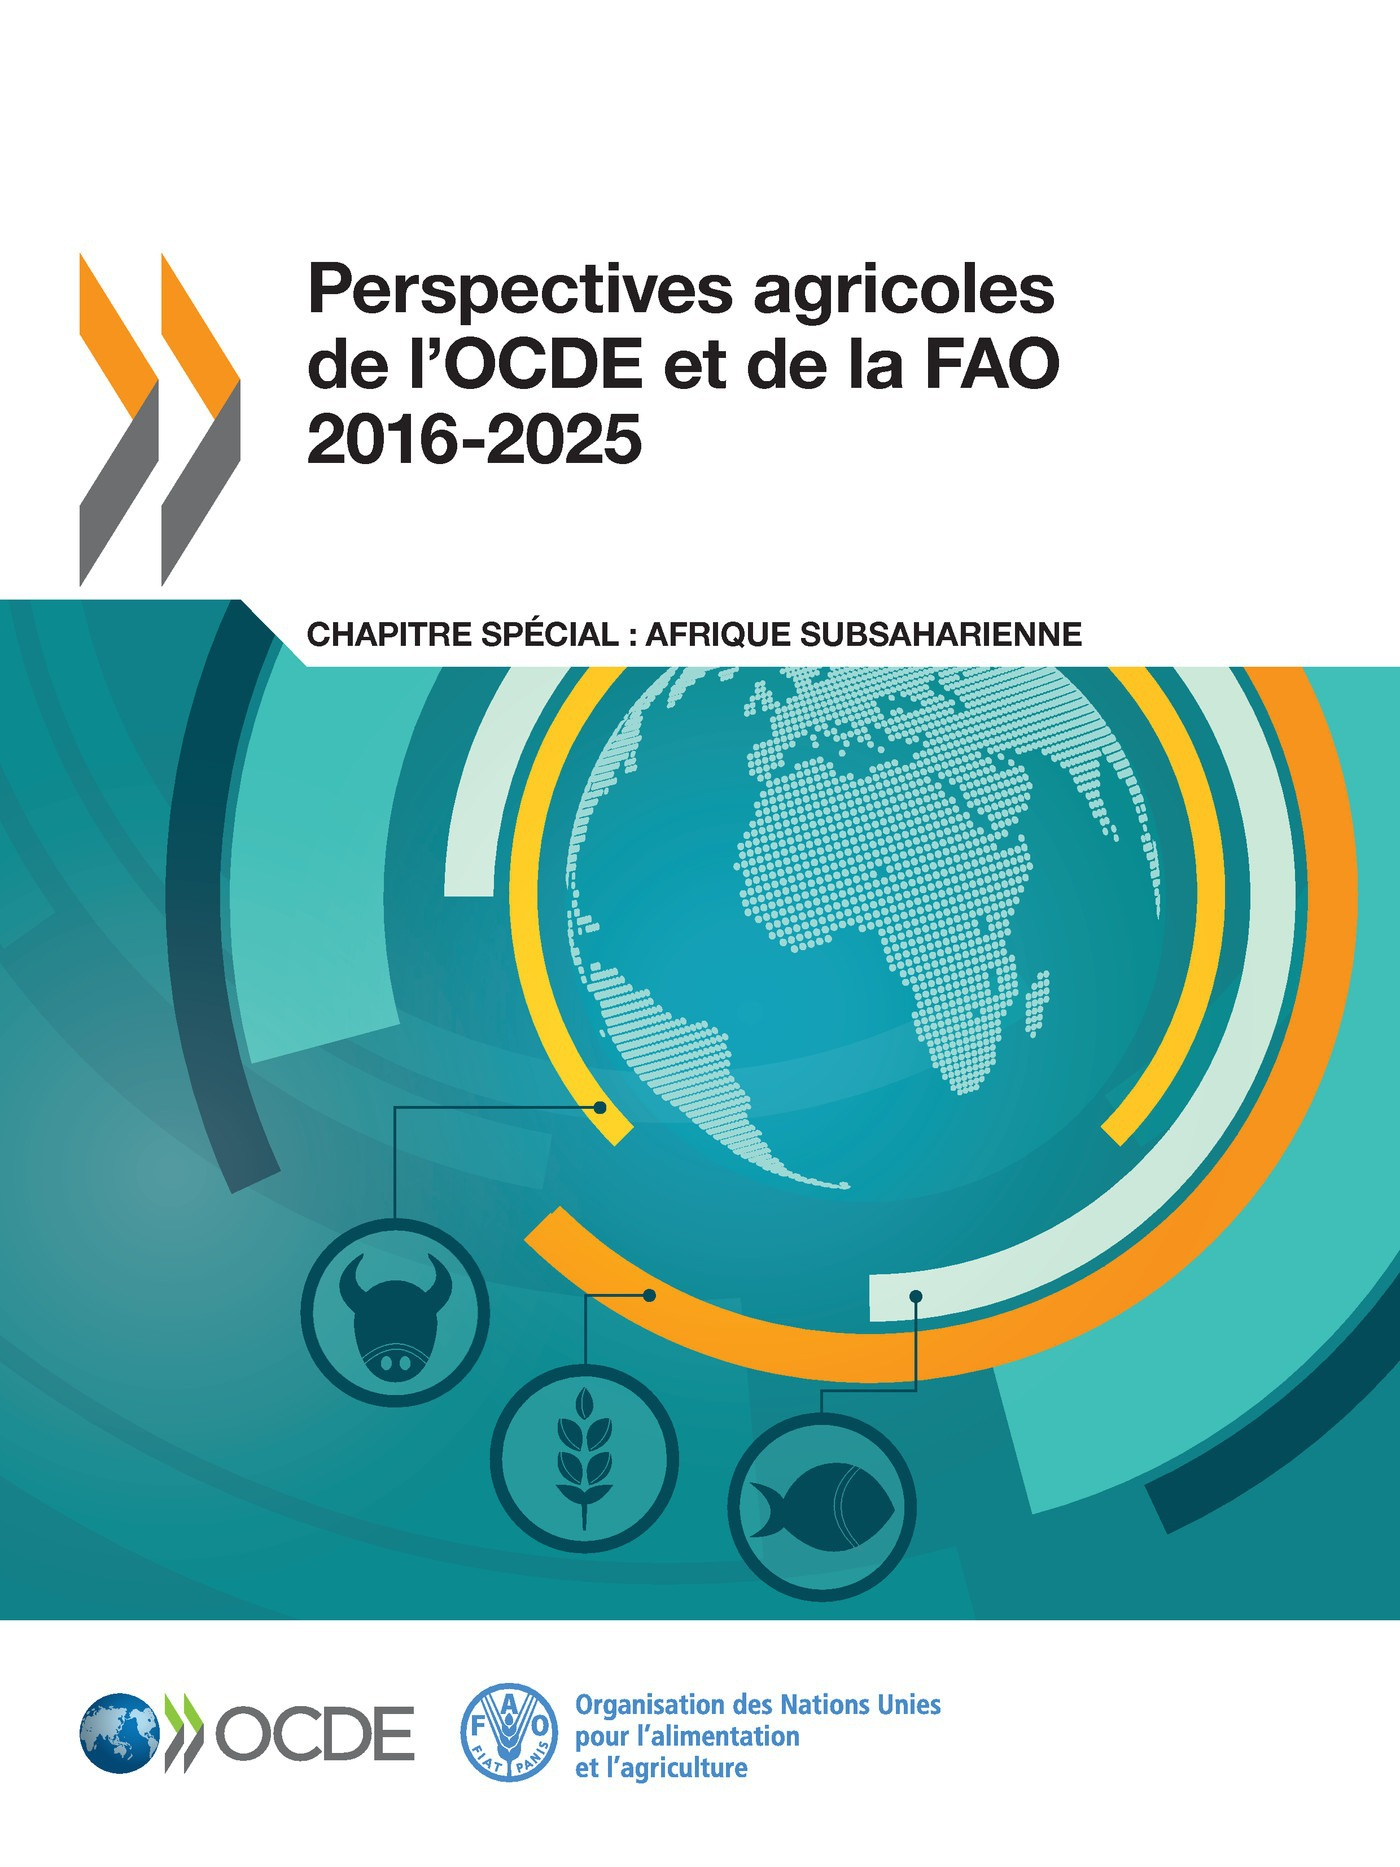 Collectif Perspectives agricoles de l'OCDE et de la FAO 2016-2025